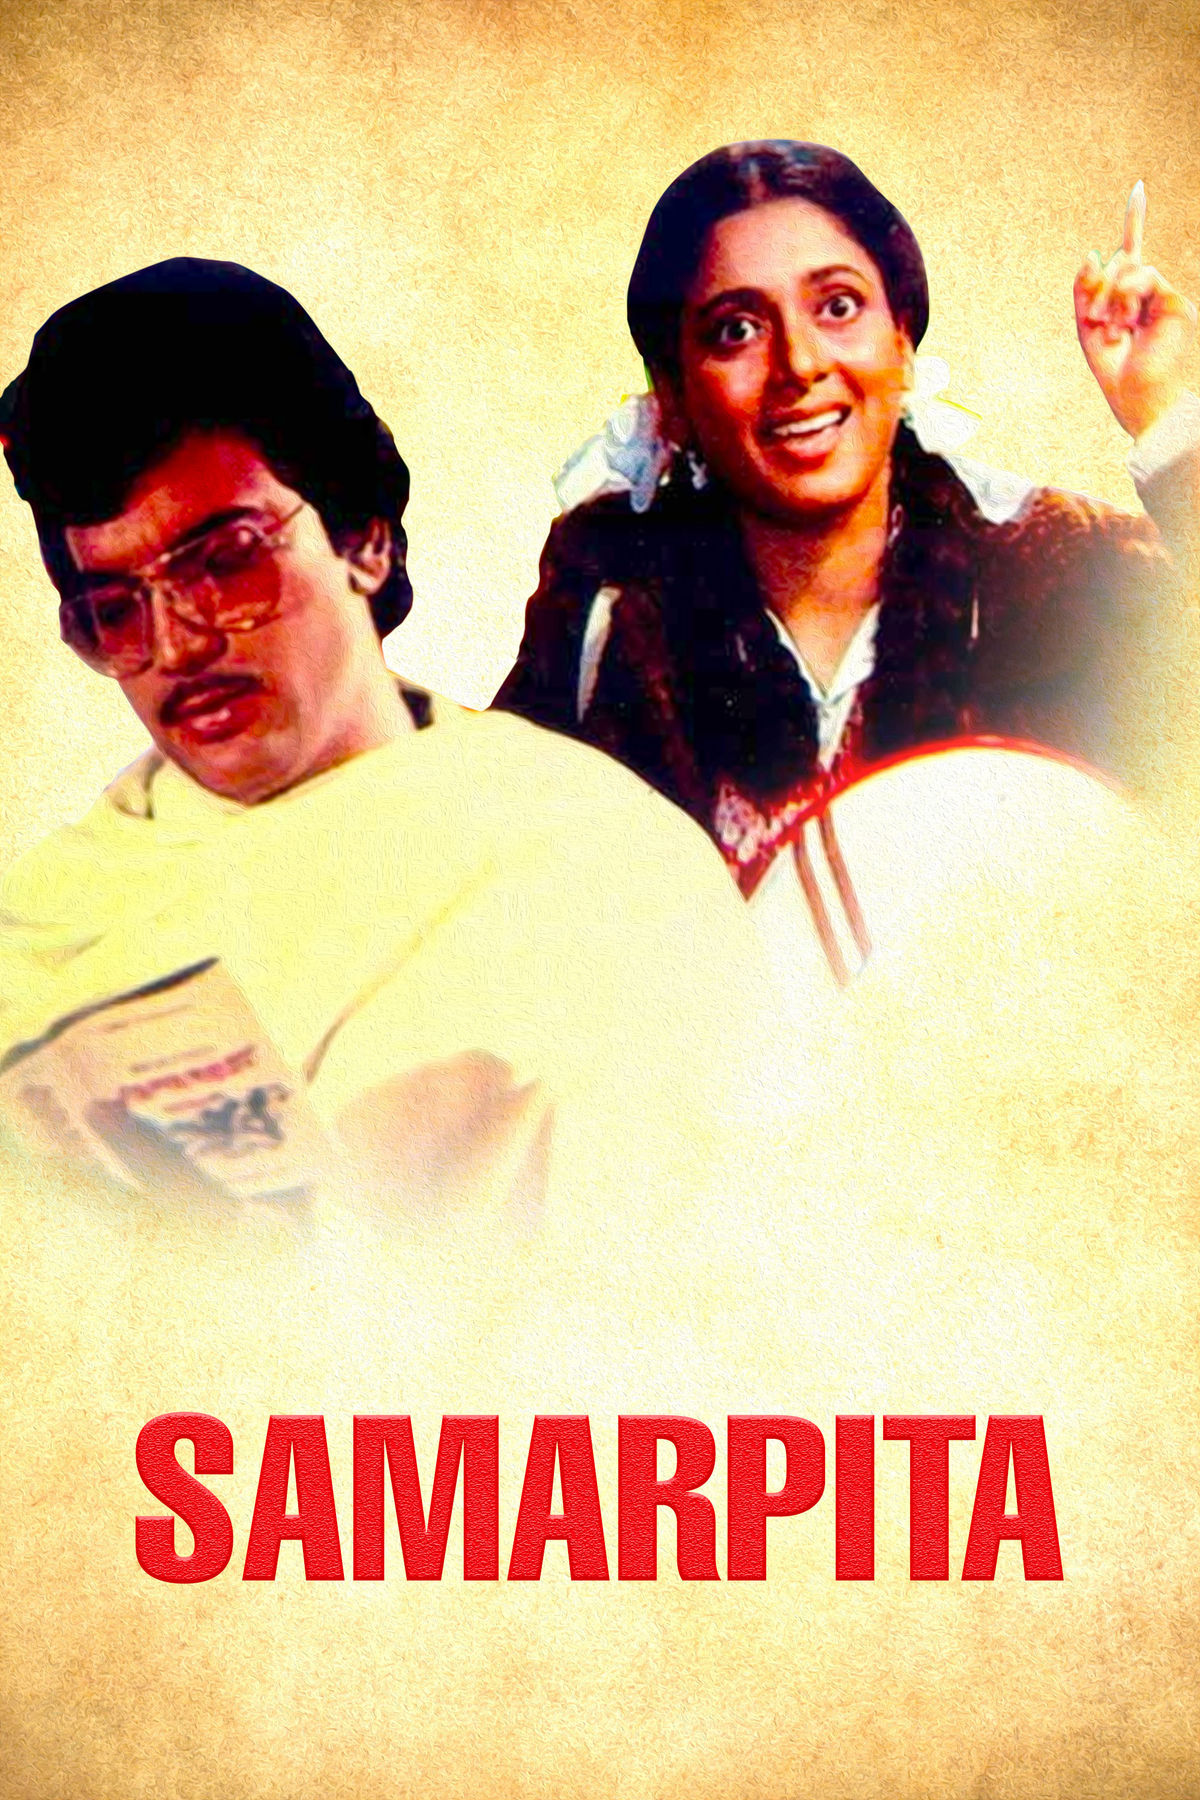 Ananda Mukherjee Best Movies, TV Shows and Web Series List